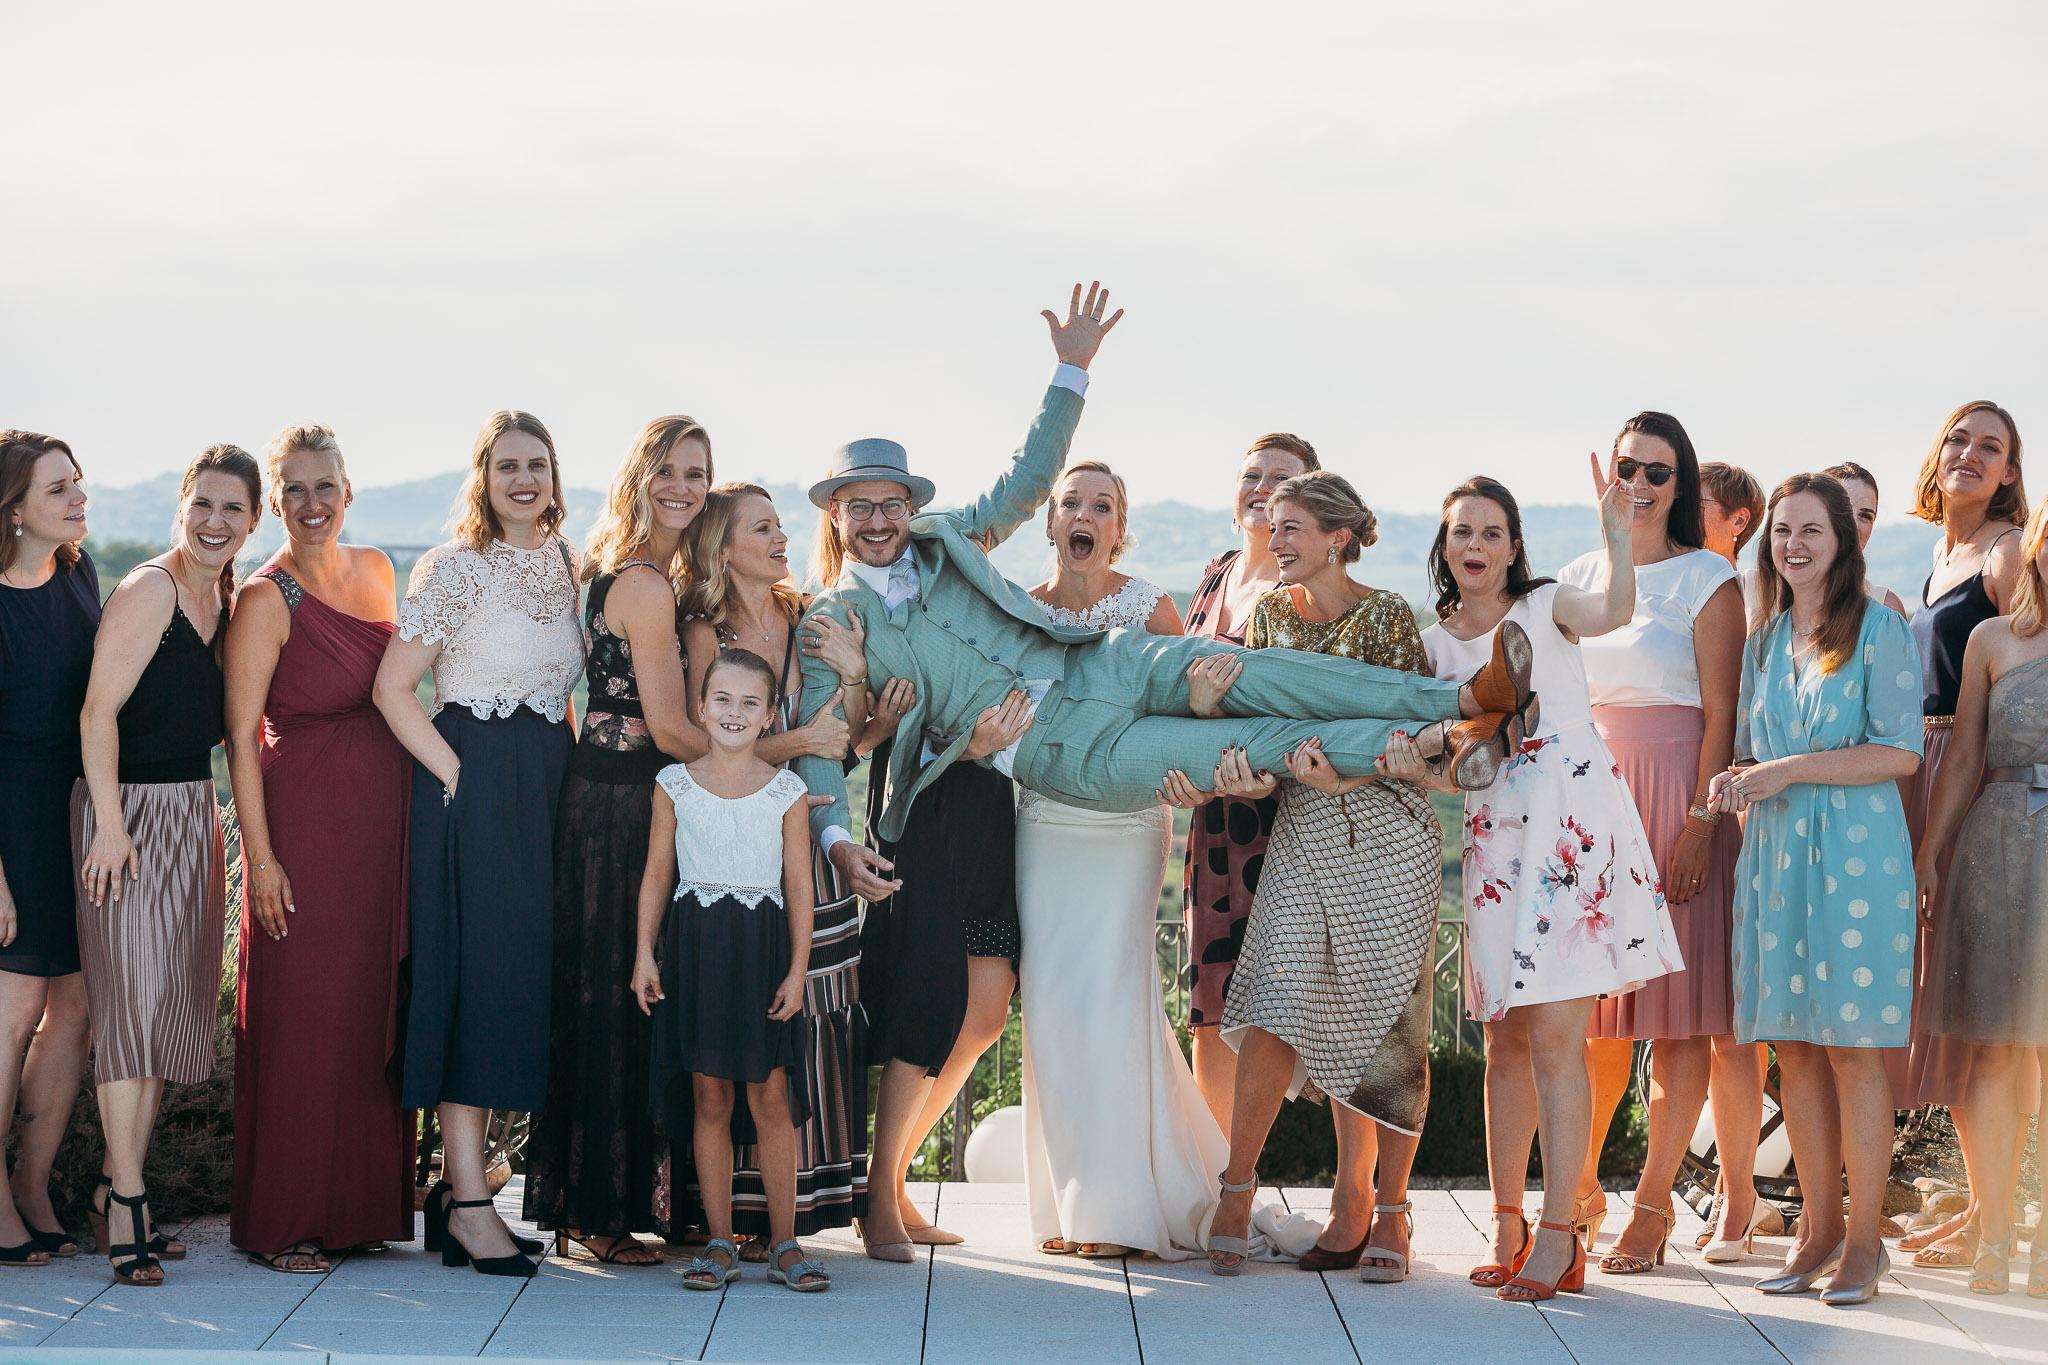 Formal weddign photo of newlyweds and friends at La Villa Hotel, Mombaruzzo